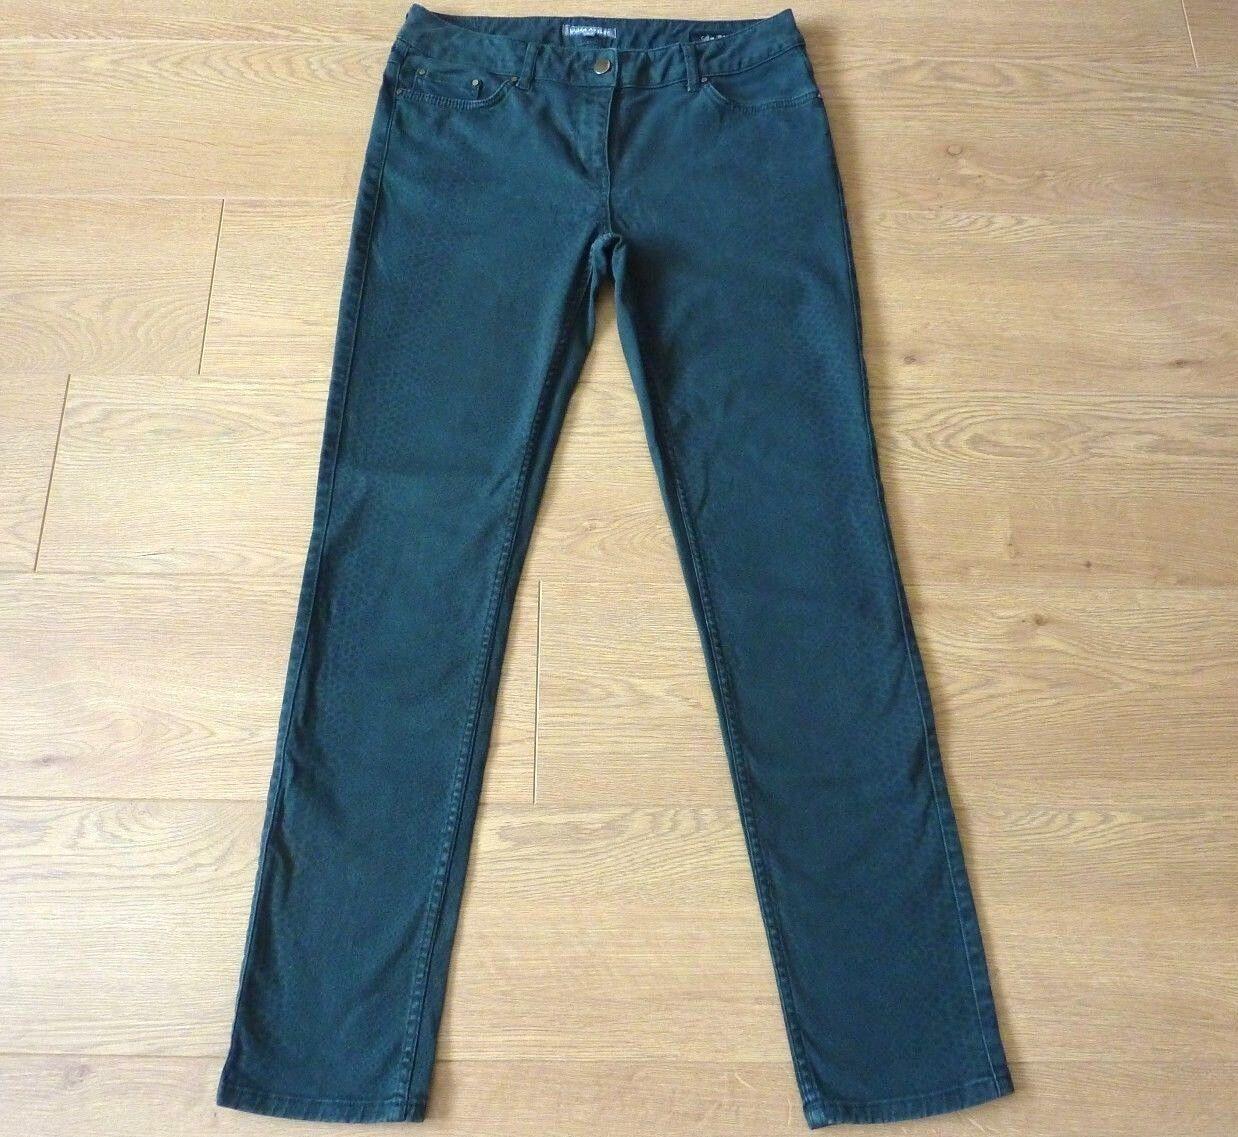 Laura Ashley Ladies Slim Fit Croc Pattern Green Jeans Size US 8